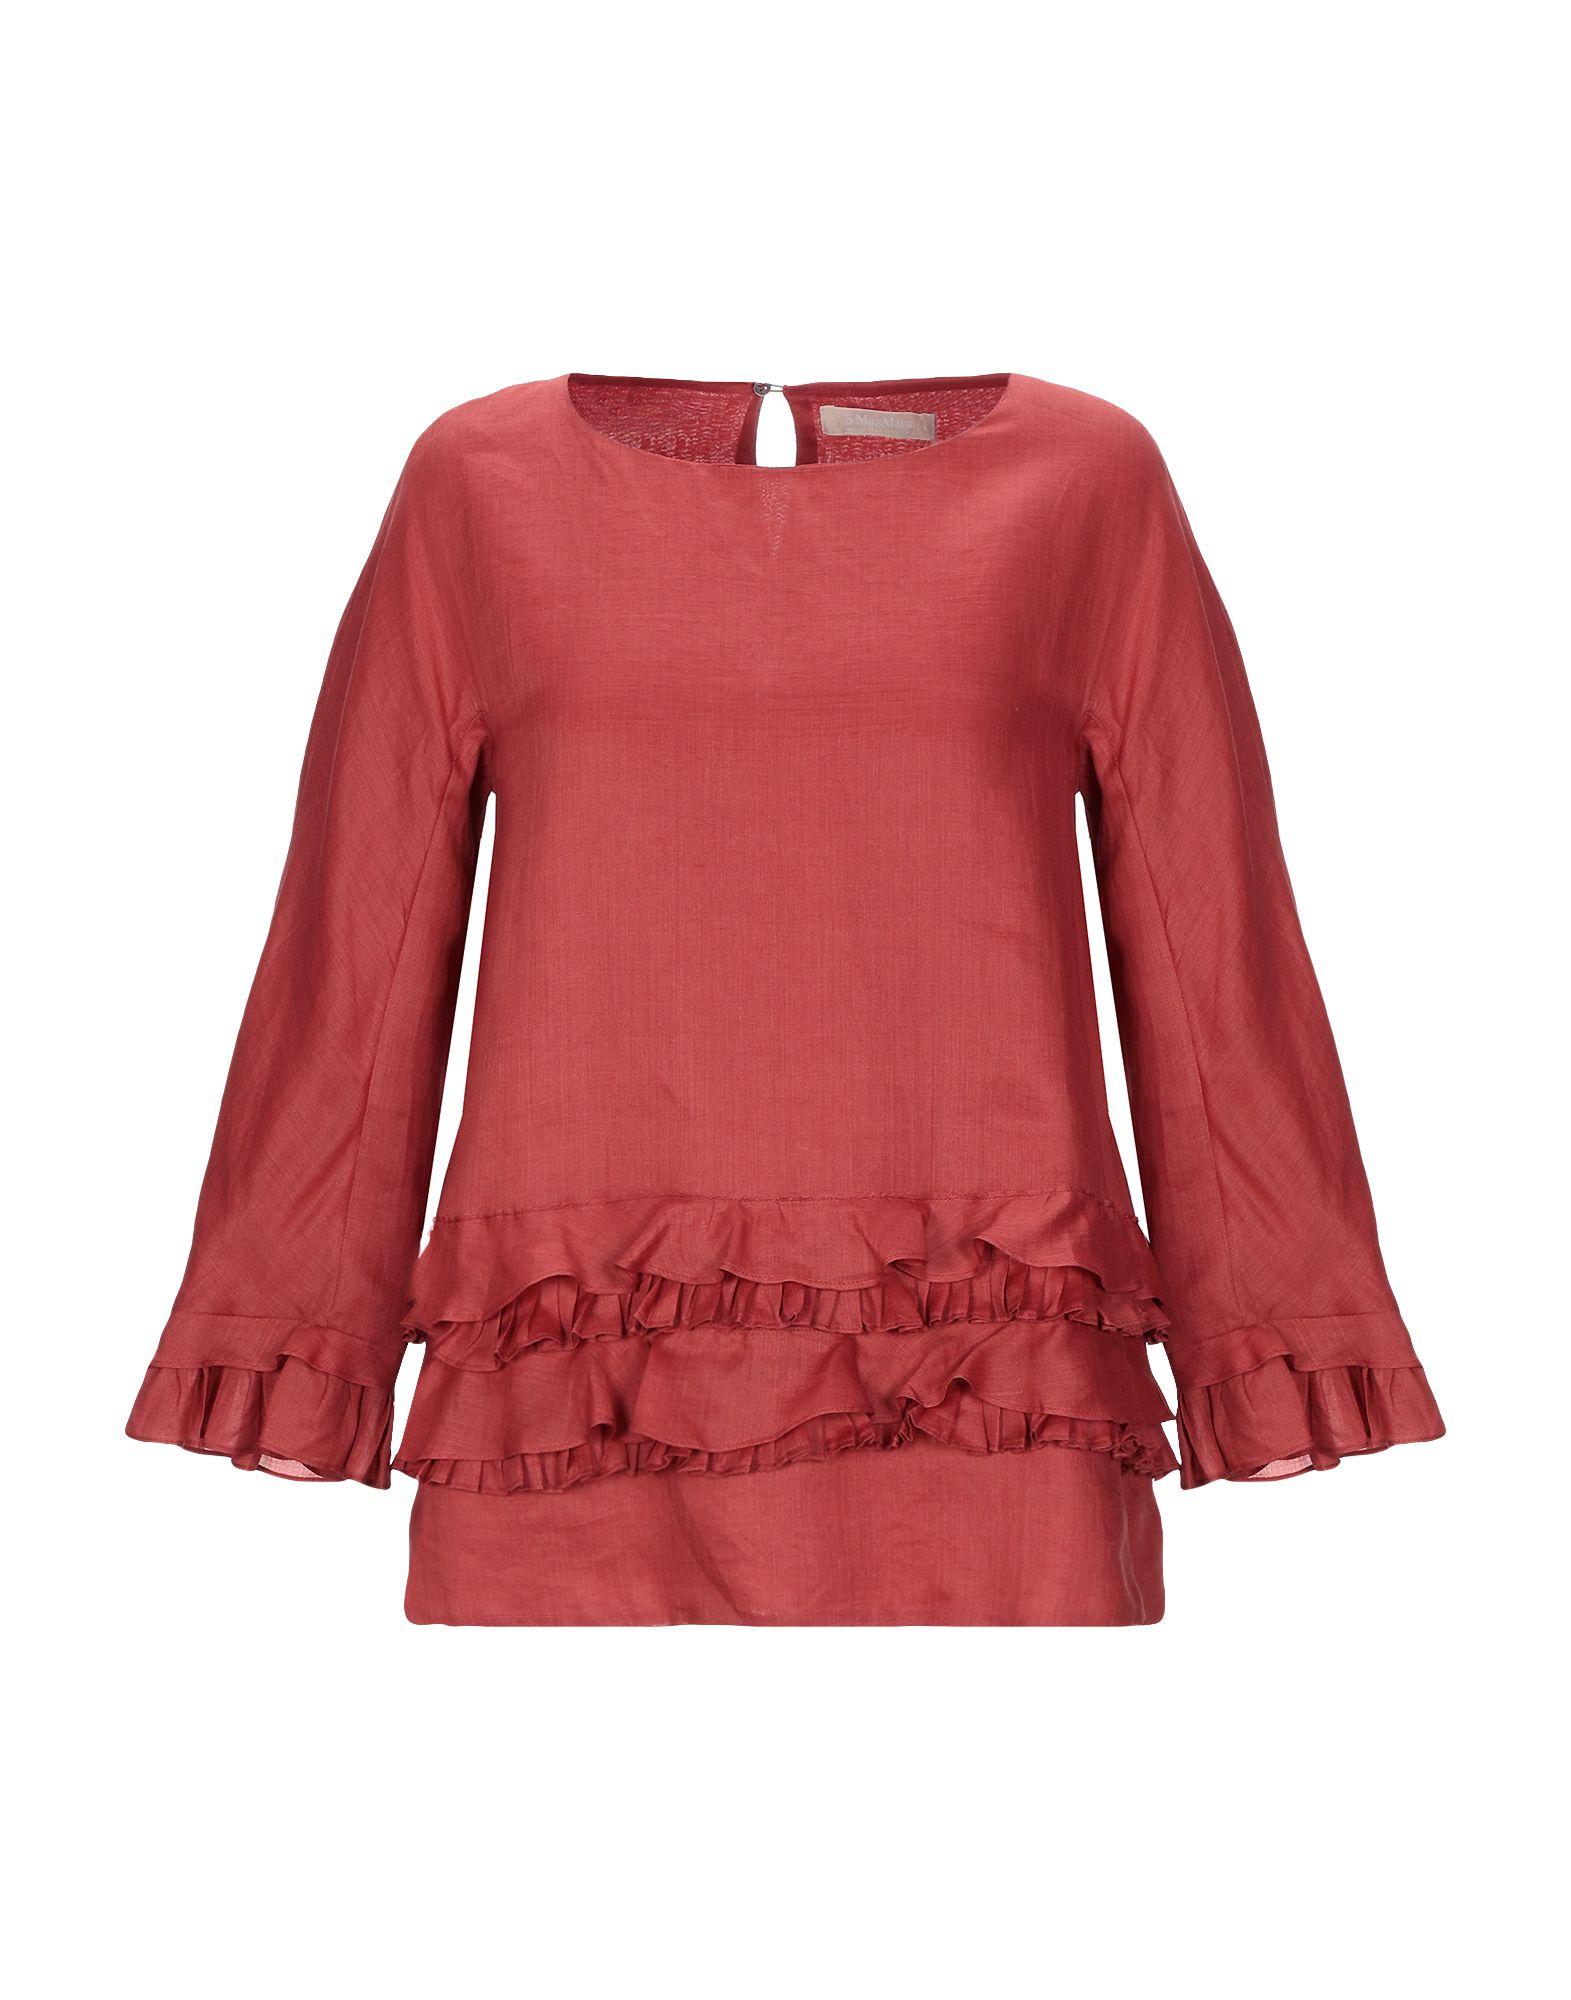 Фото - 'S MAX MARA Блузка henry cotton s блузка